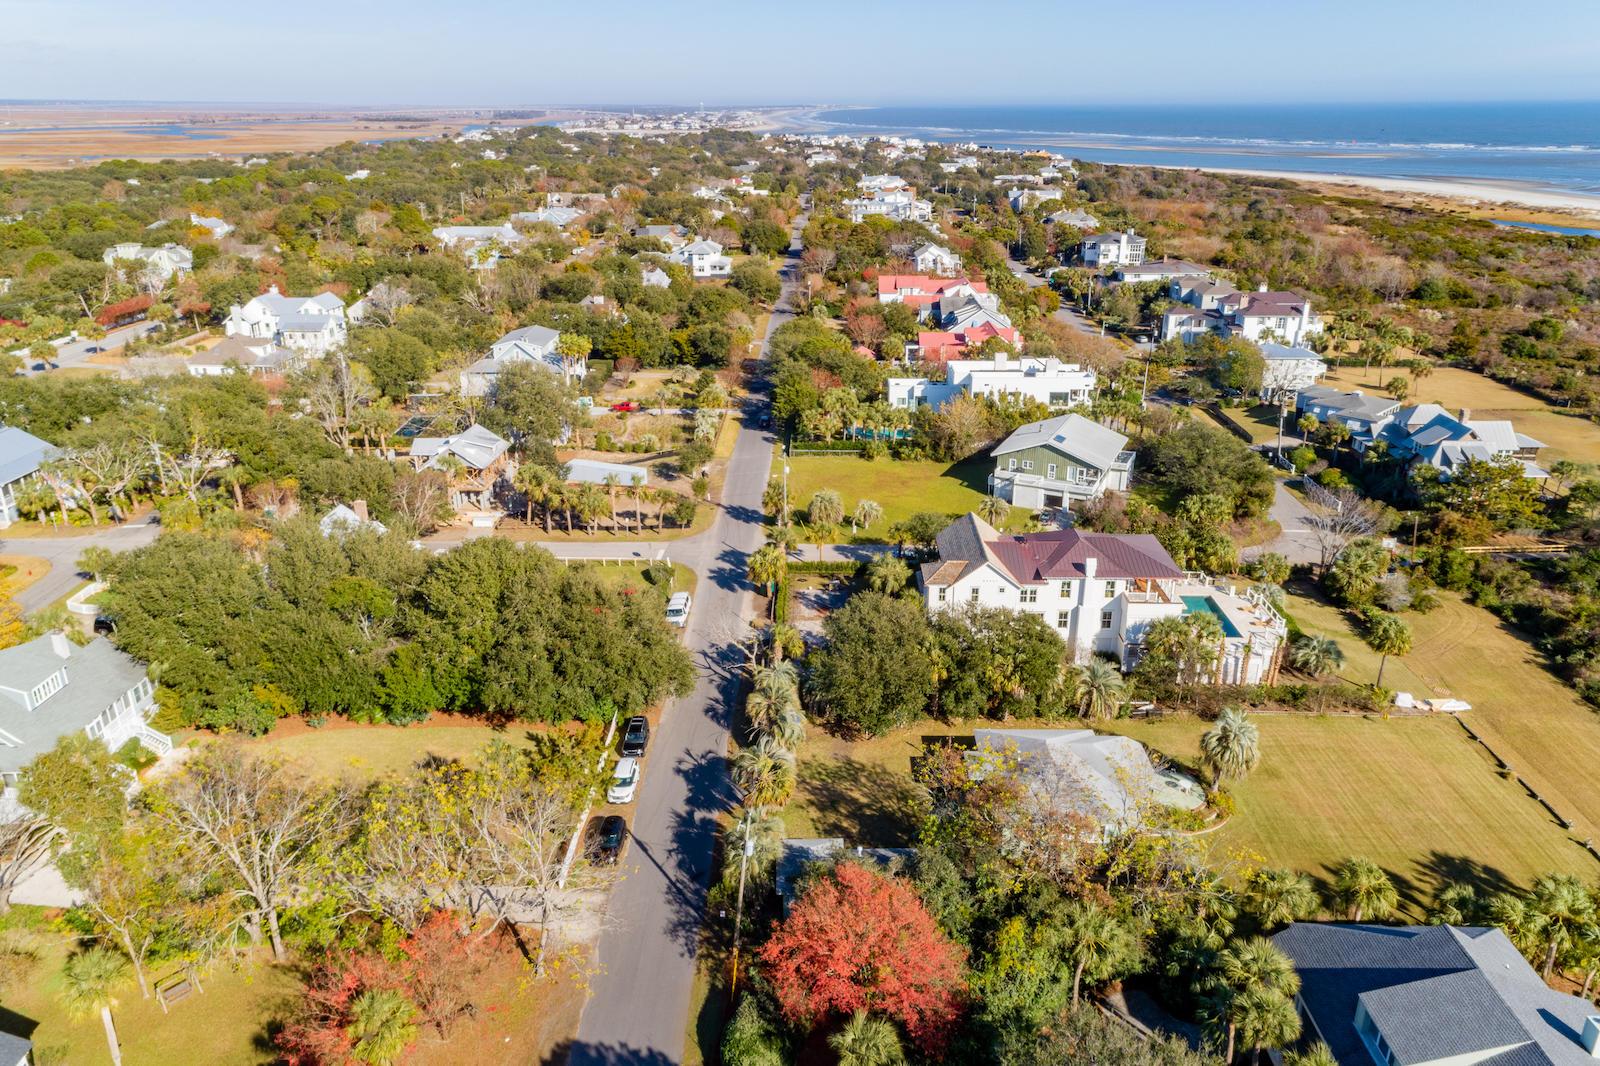 Sullivans Island Homes For Sale - 2525 Atlantic, Sullivans Island, SC - 2